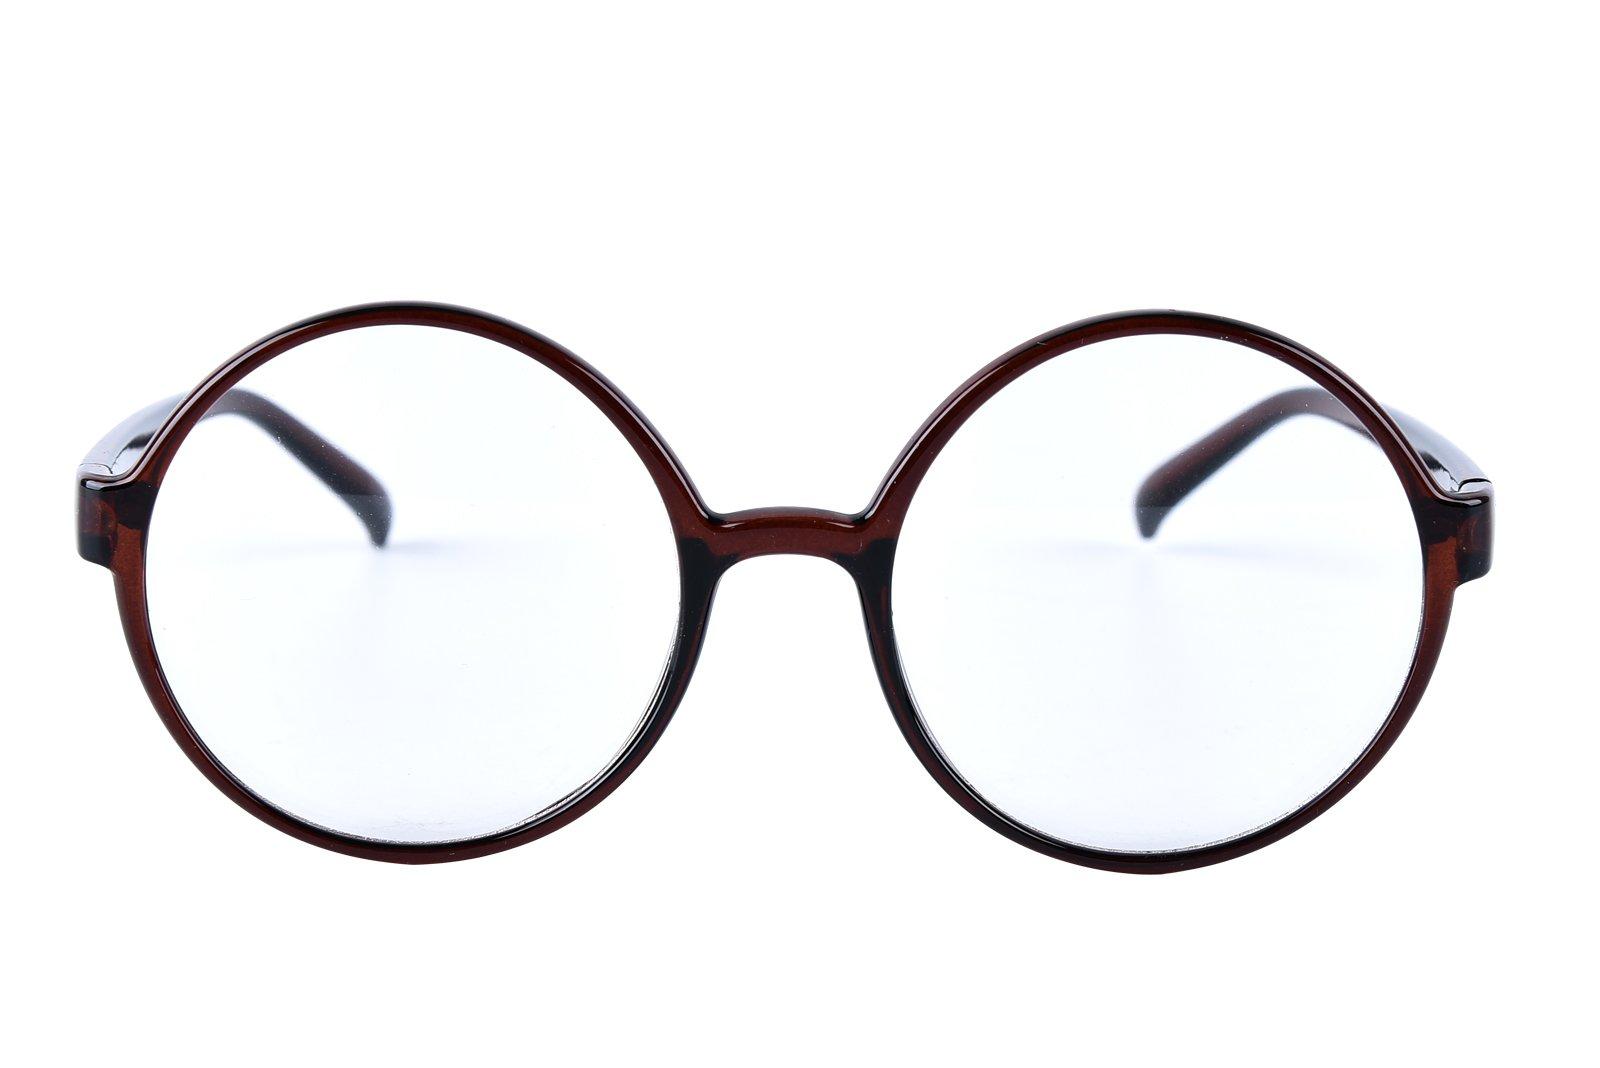 Agstum Retro Round Glasses Frame Clear Lens Fashion Circle Eyeglasses 52mm (Brown, 52mm) by Agstum